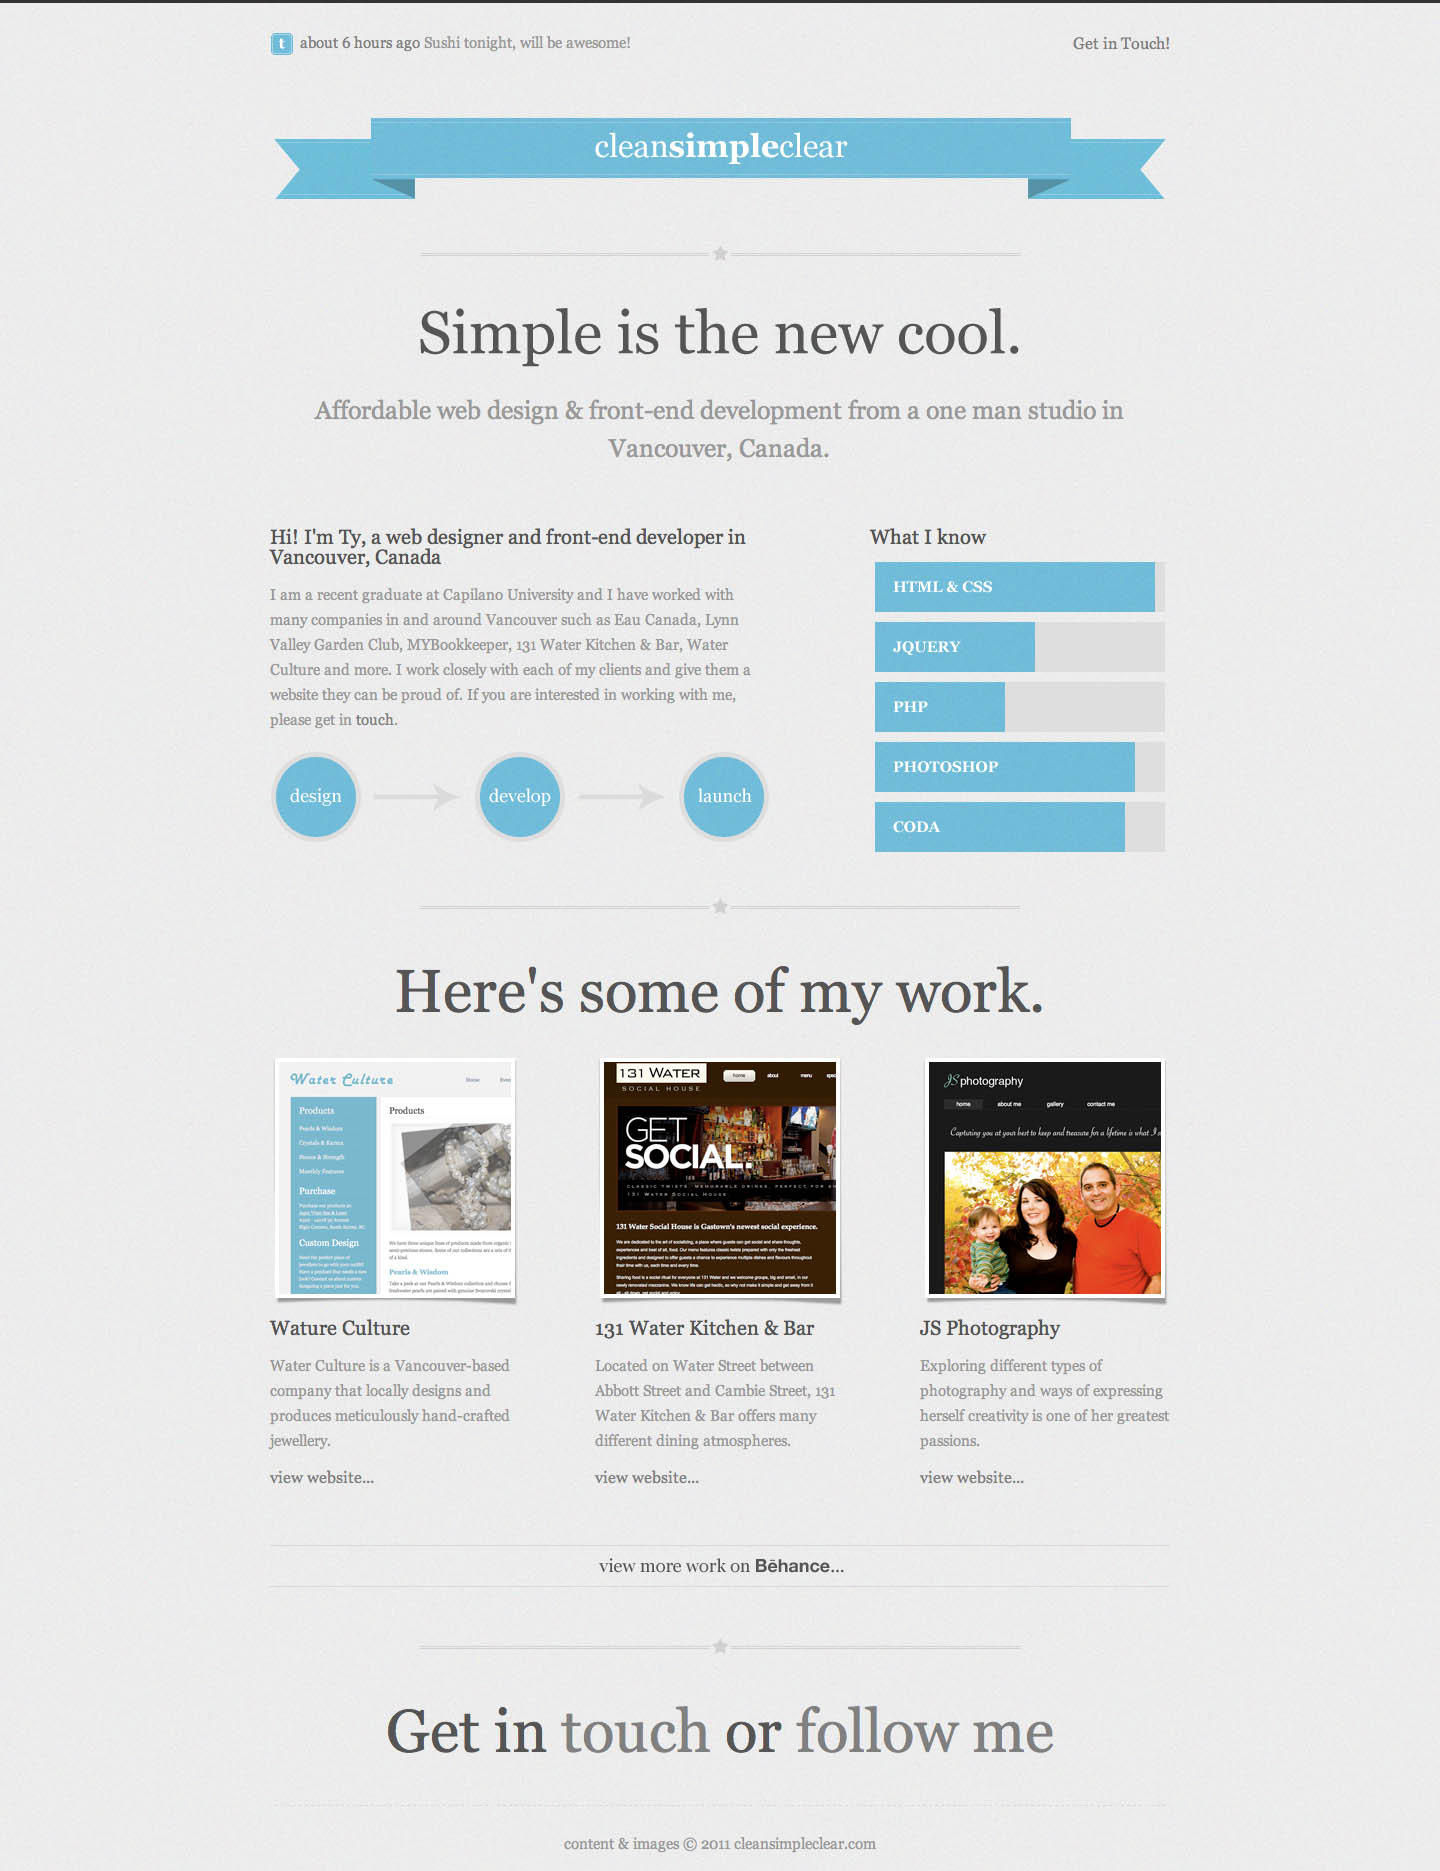 Clean Simple Clear Website Screenshot